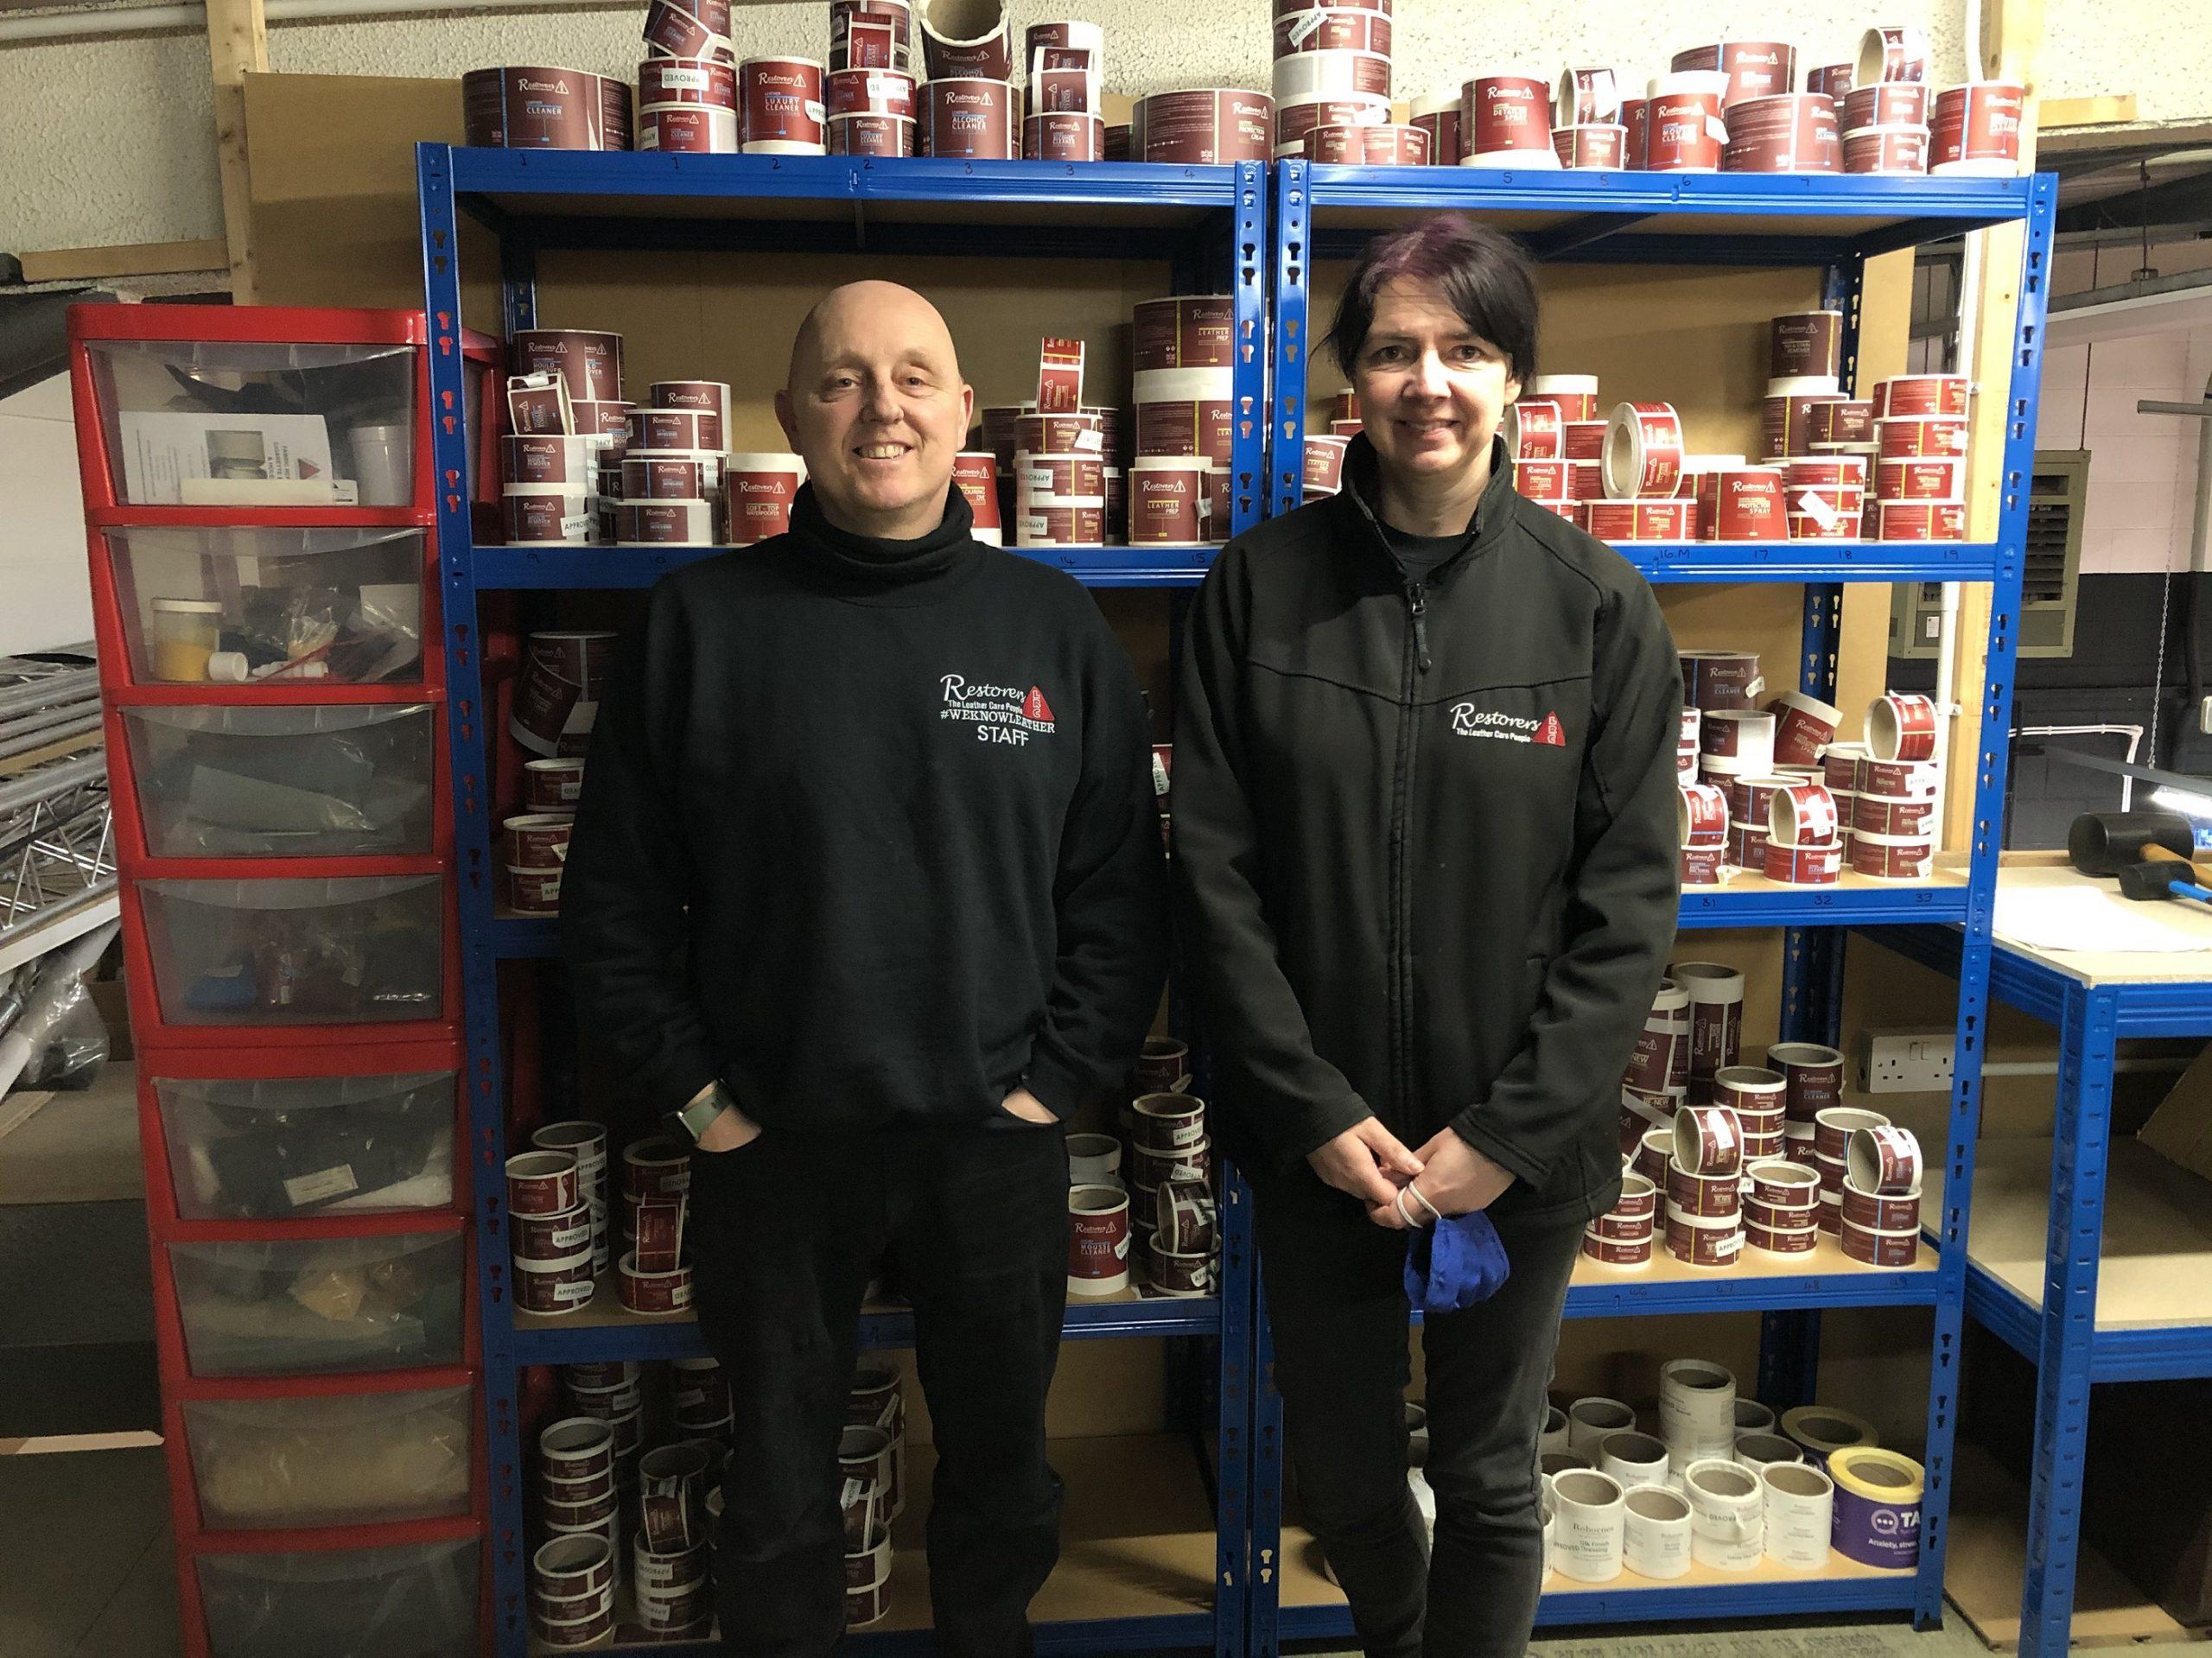 Richard & Carolynne Hutchins Leather Repair Company Hull